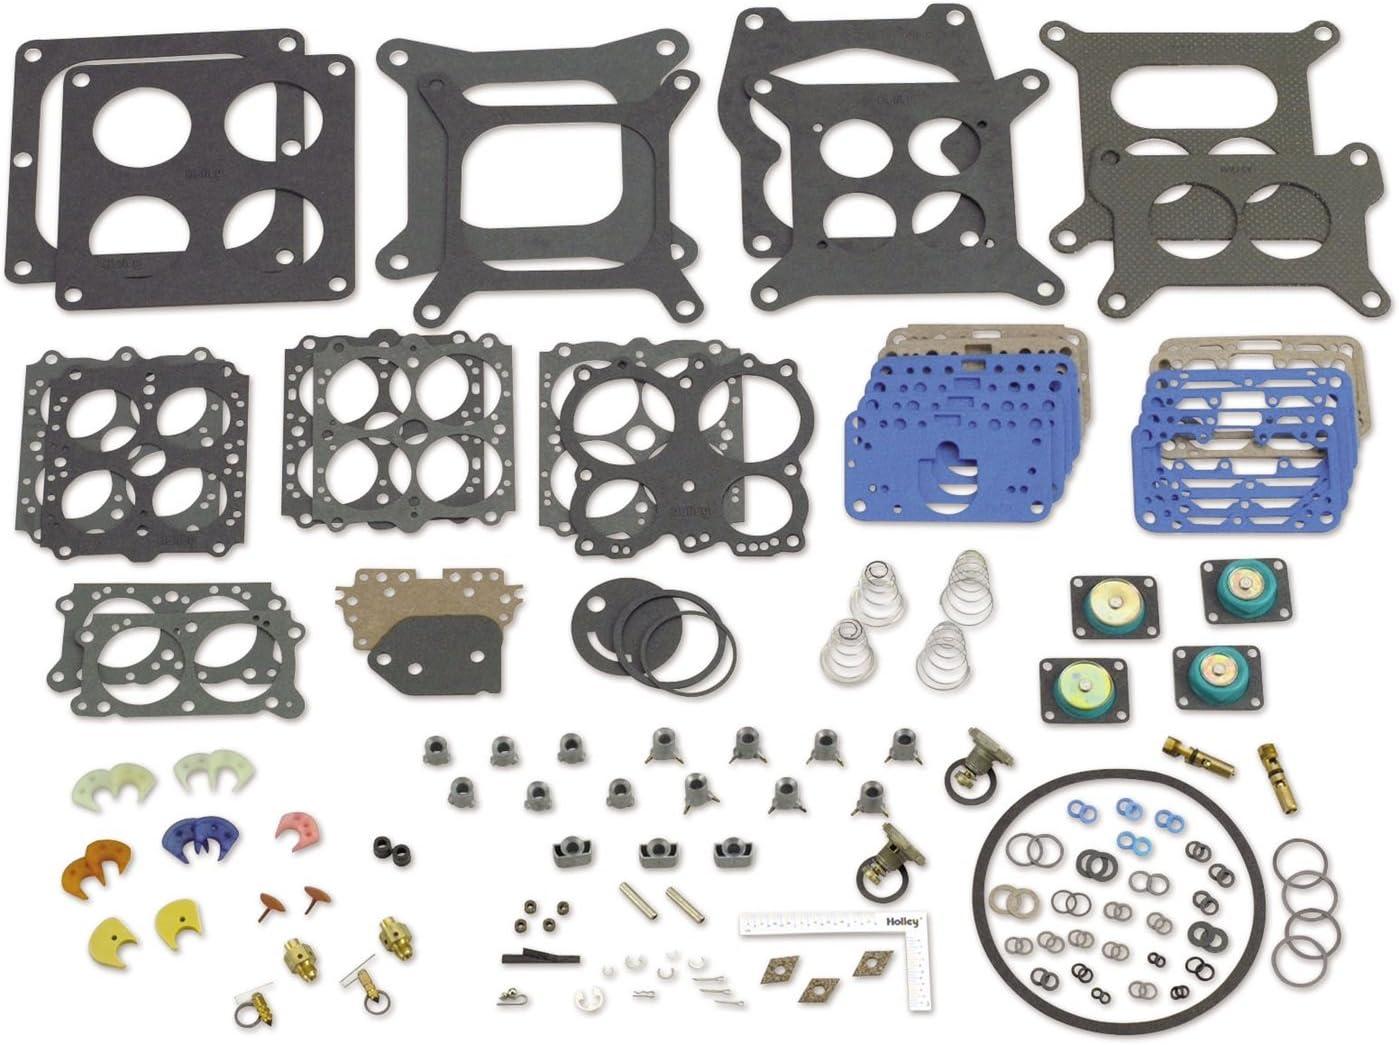 Holley Performance 37-933 Trick Kit Carburetor Rebuild Kit